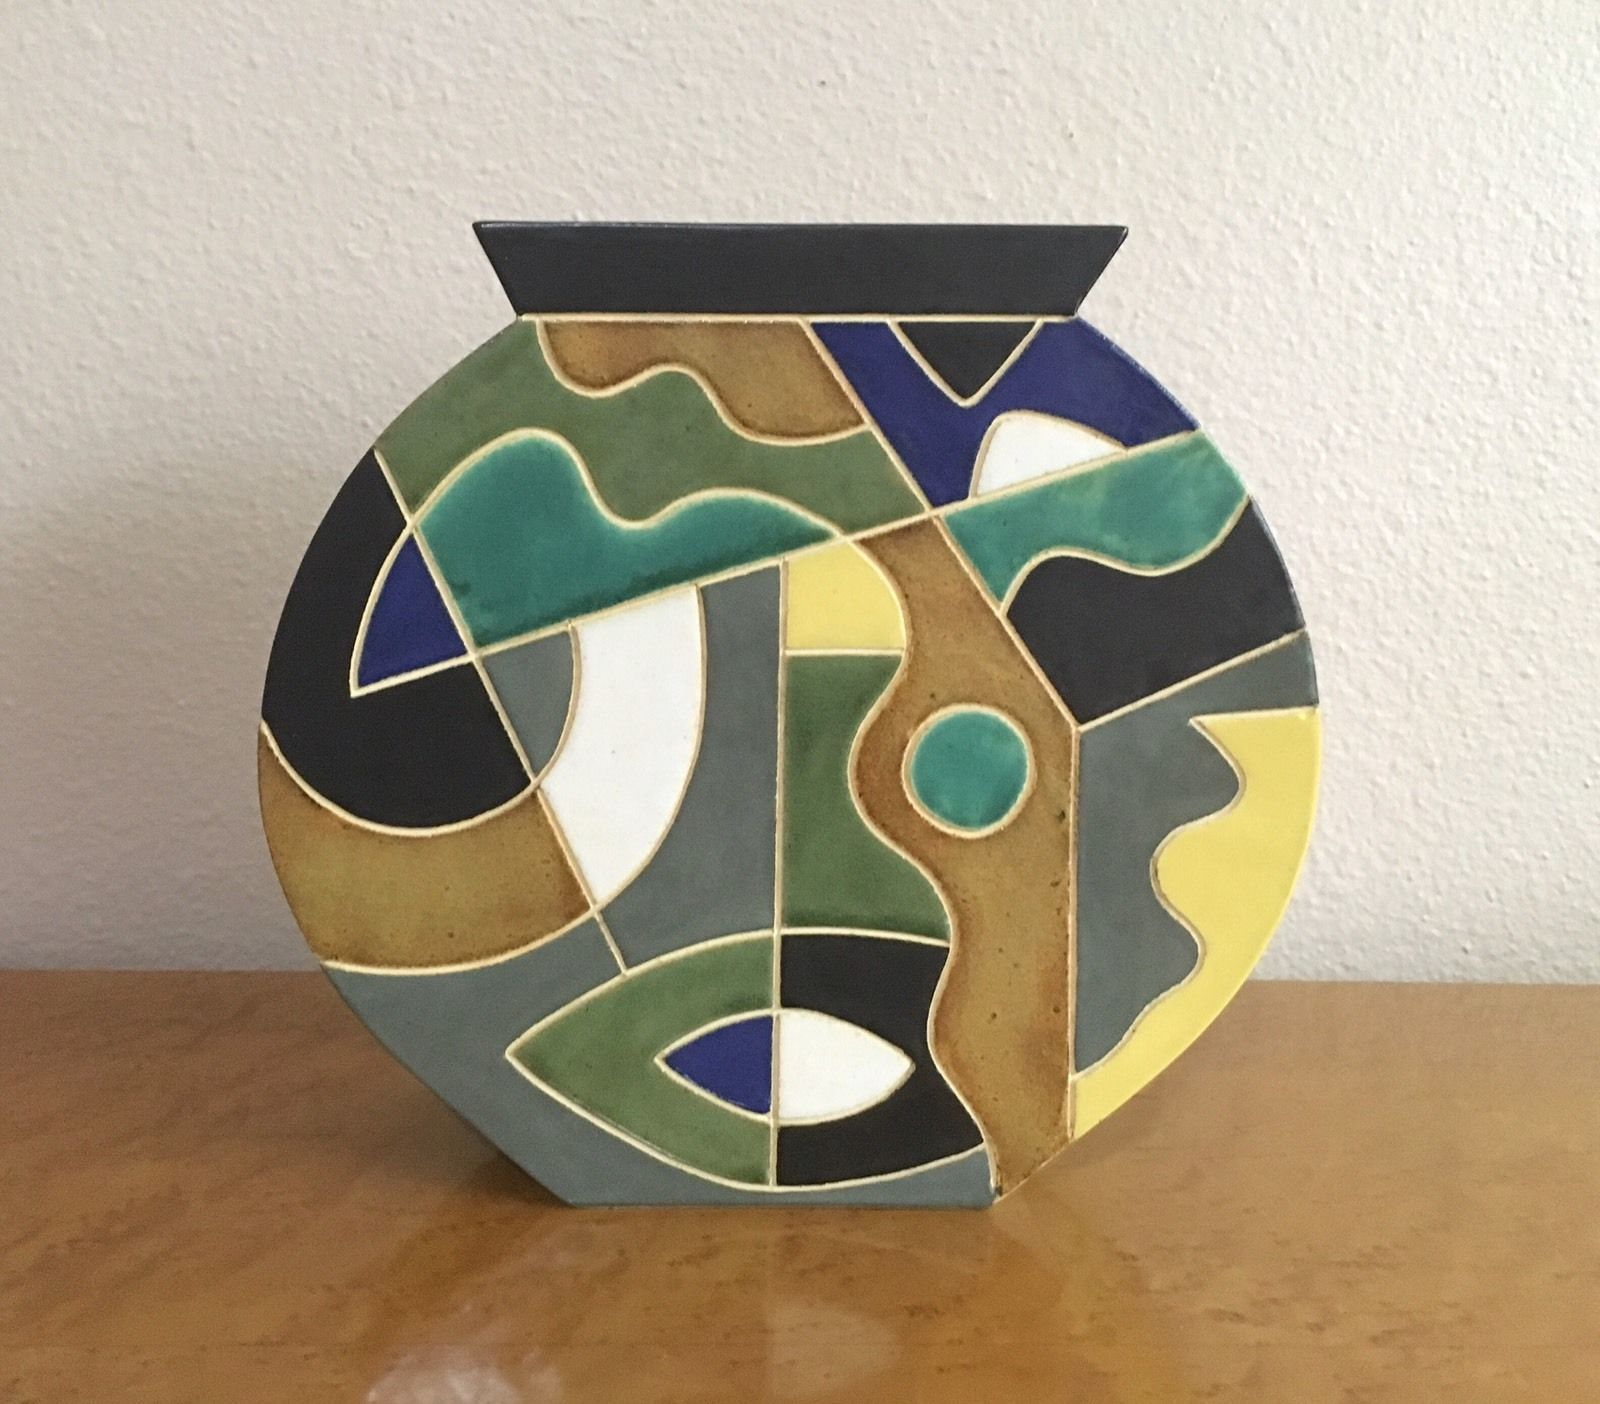 Gary dipasquale postmodern studio pottery vase 1 of 2 ny